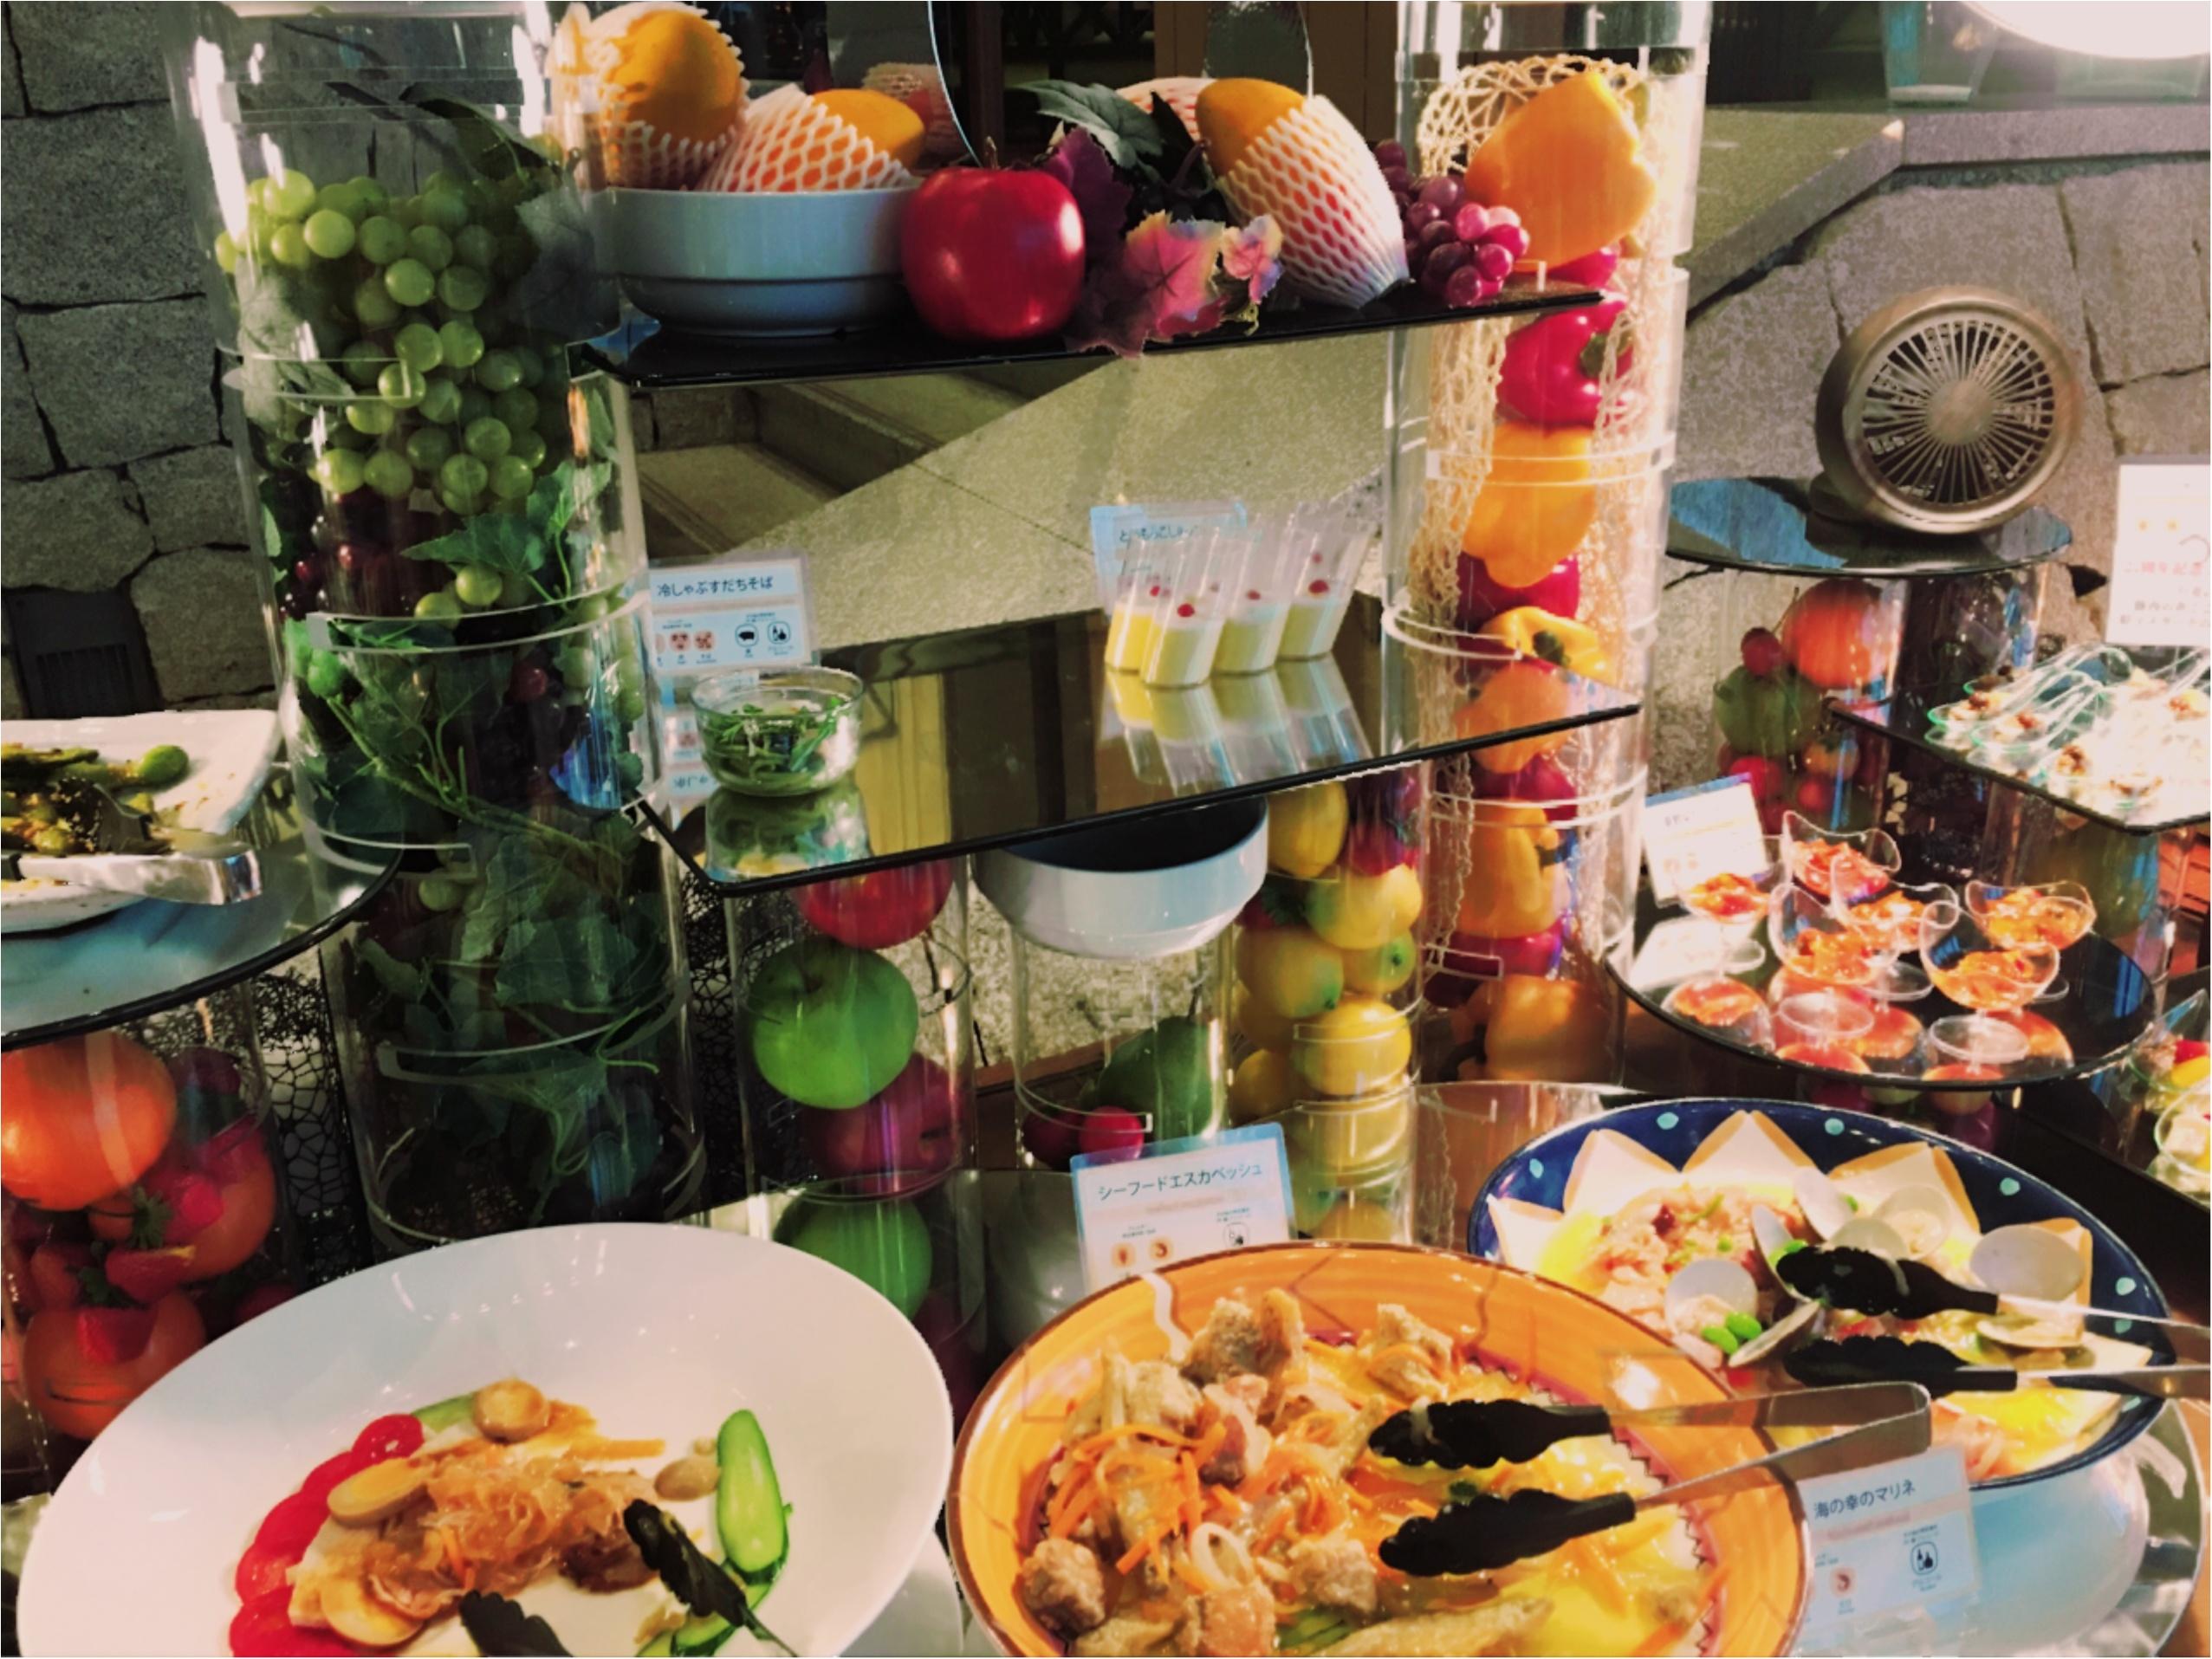 【DINNER】いまお得なディナーはココ!第一ホテル東京シーフォートへ行ってきました☆_4